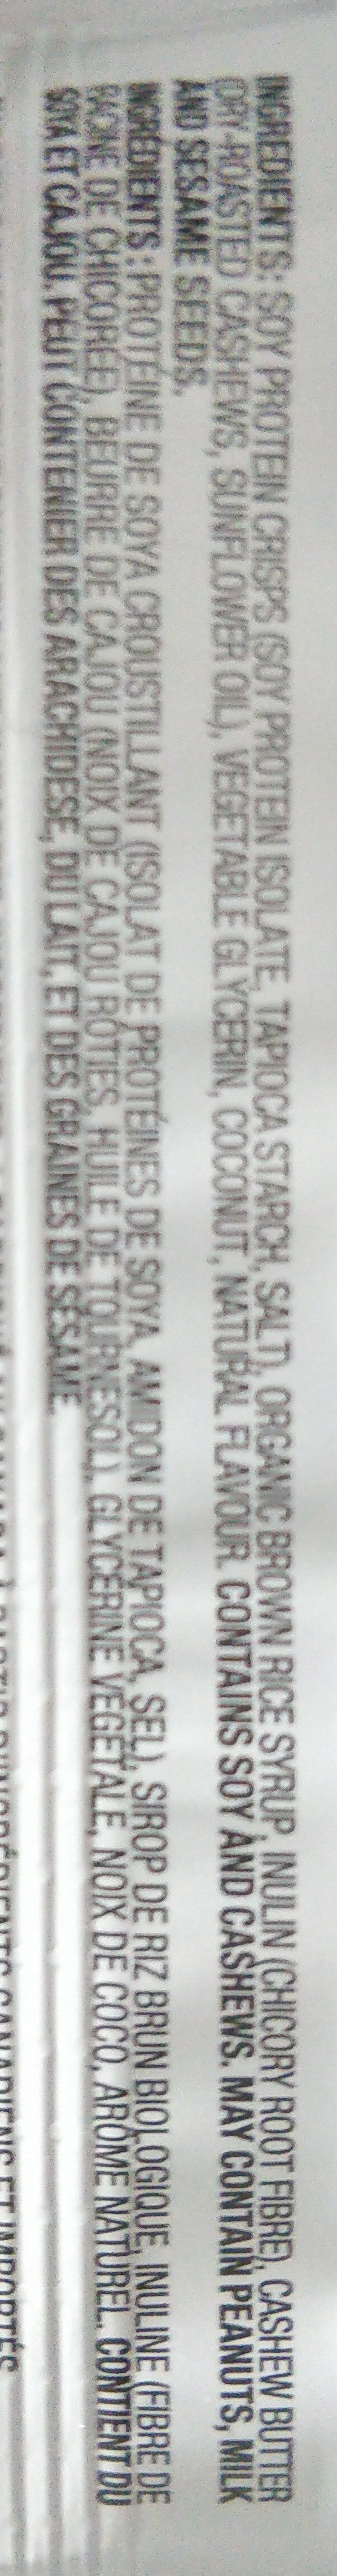 Protein Bar, Lemon Coconut - Ingredients - en